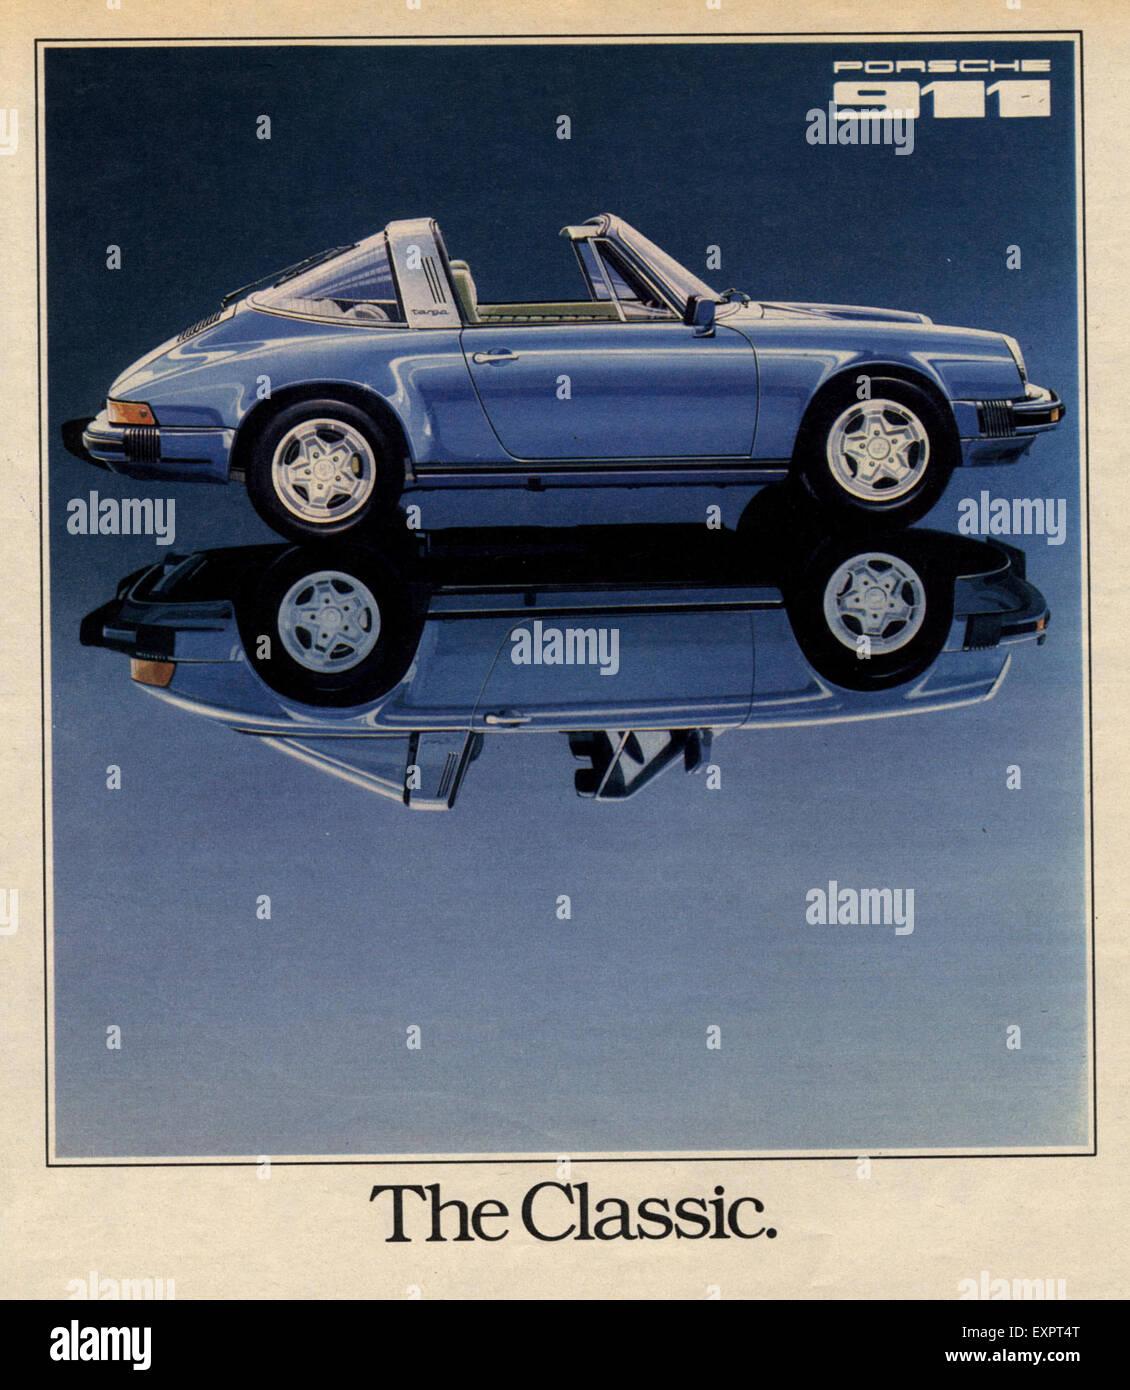 1970s UK Porsche 911 Magazine Advert - Stock Image